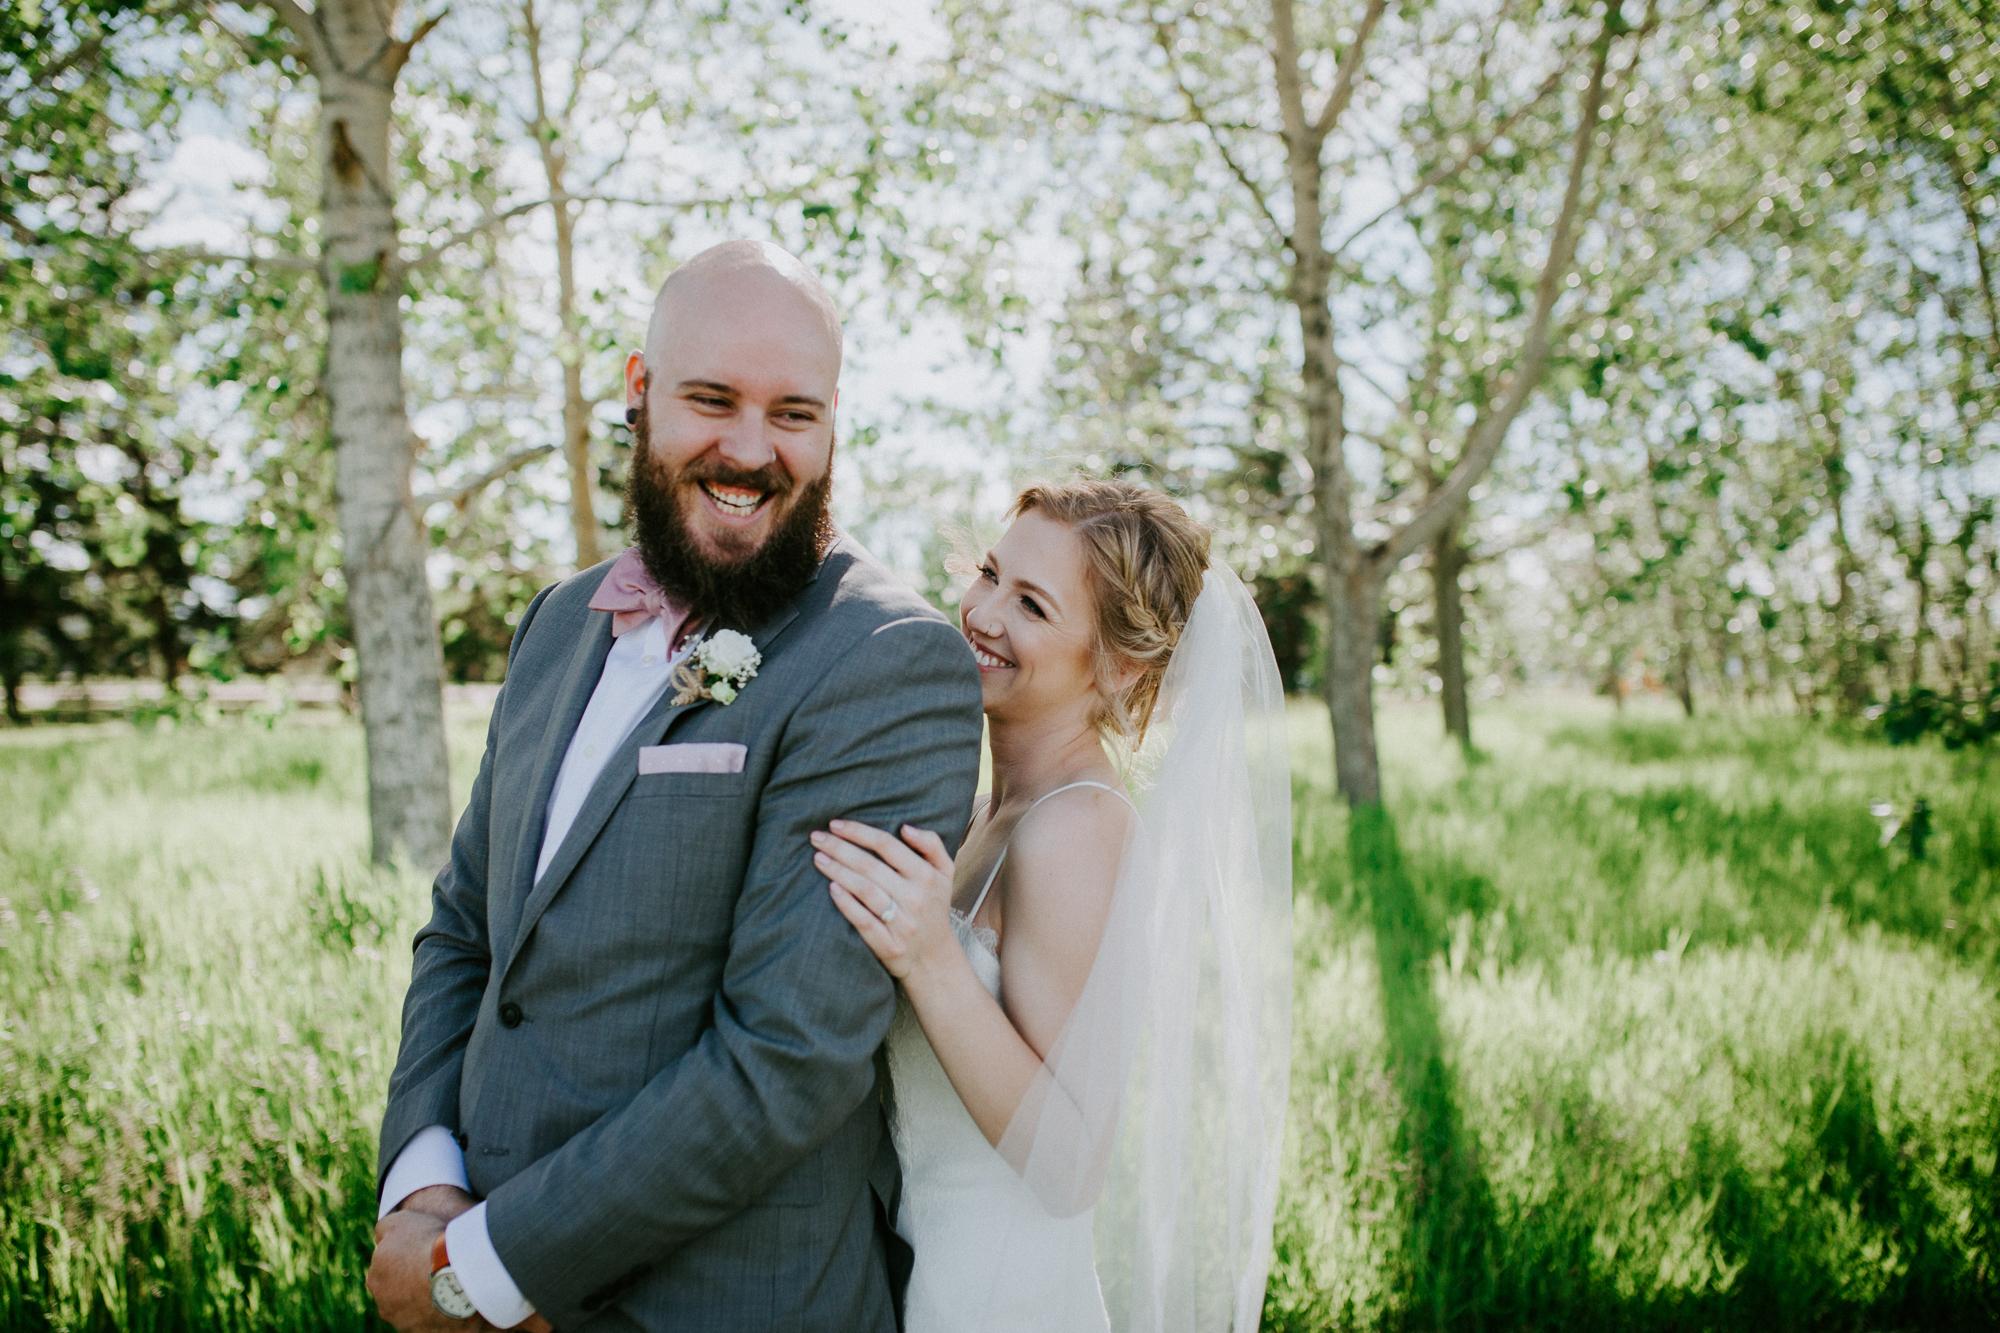 Calgary-wedding-photographer-am-72.jpg